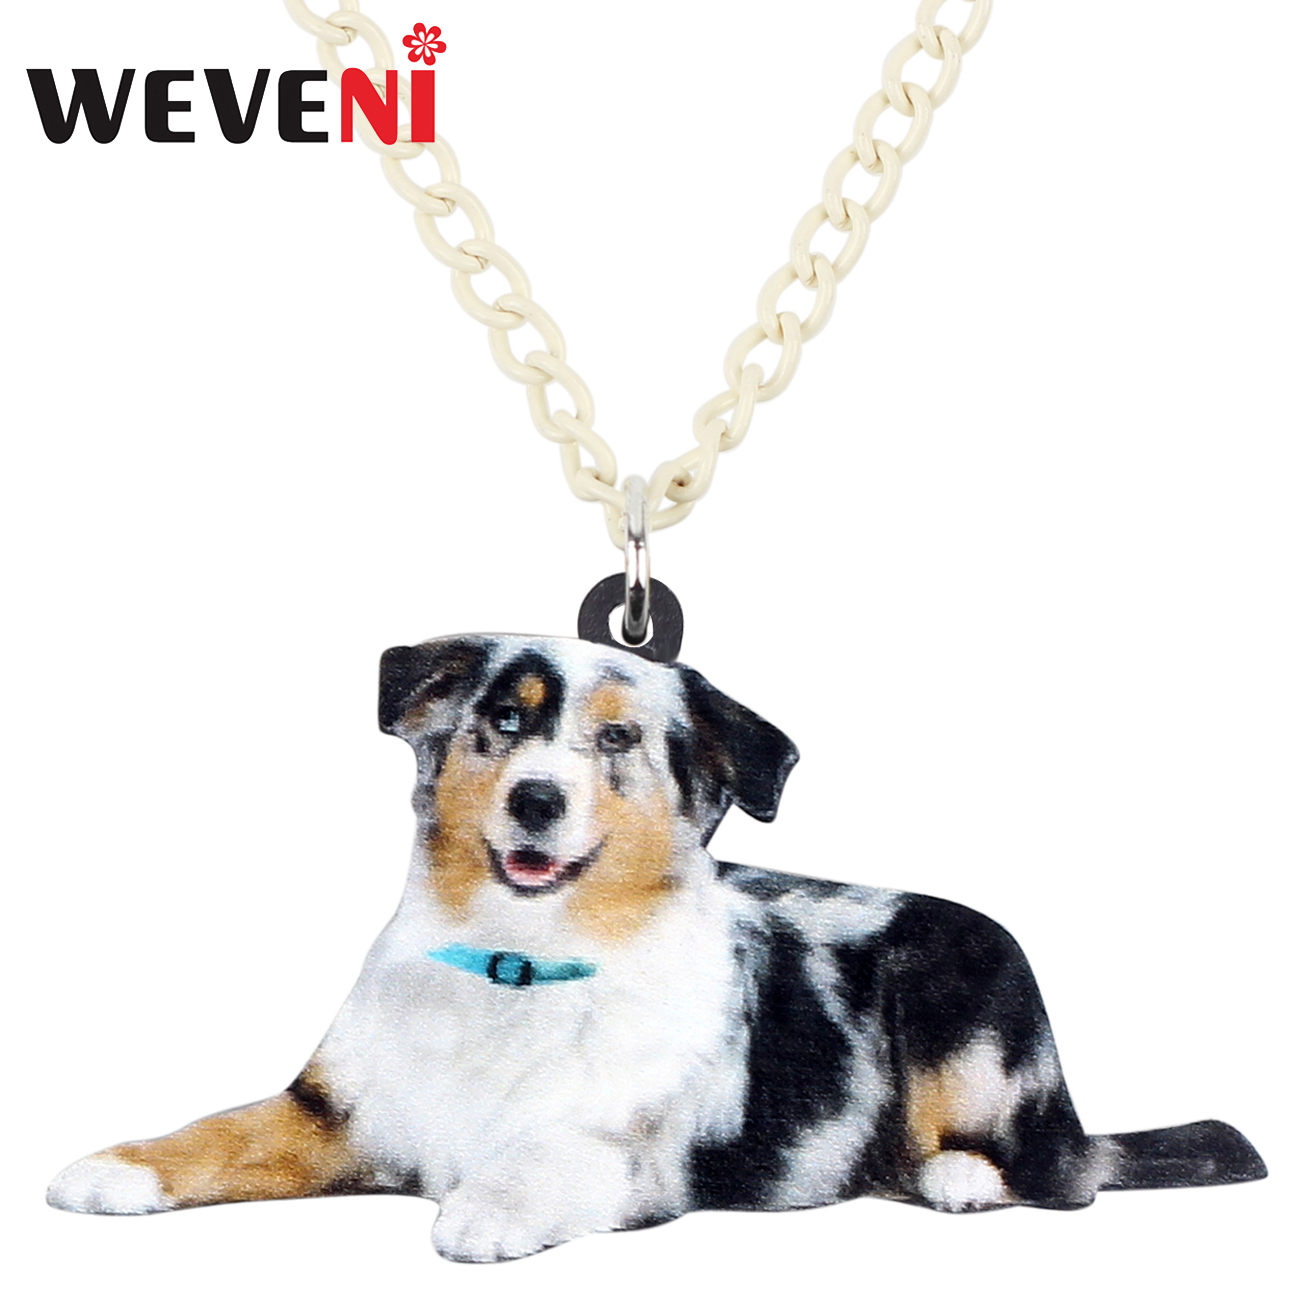 WEVENI Statement Acrylic Australian Shepherd Dog Necklace Pendant Sweater Collar Cute Animal Pet Jewelry For Women Girls Gift